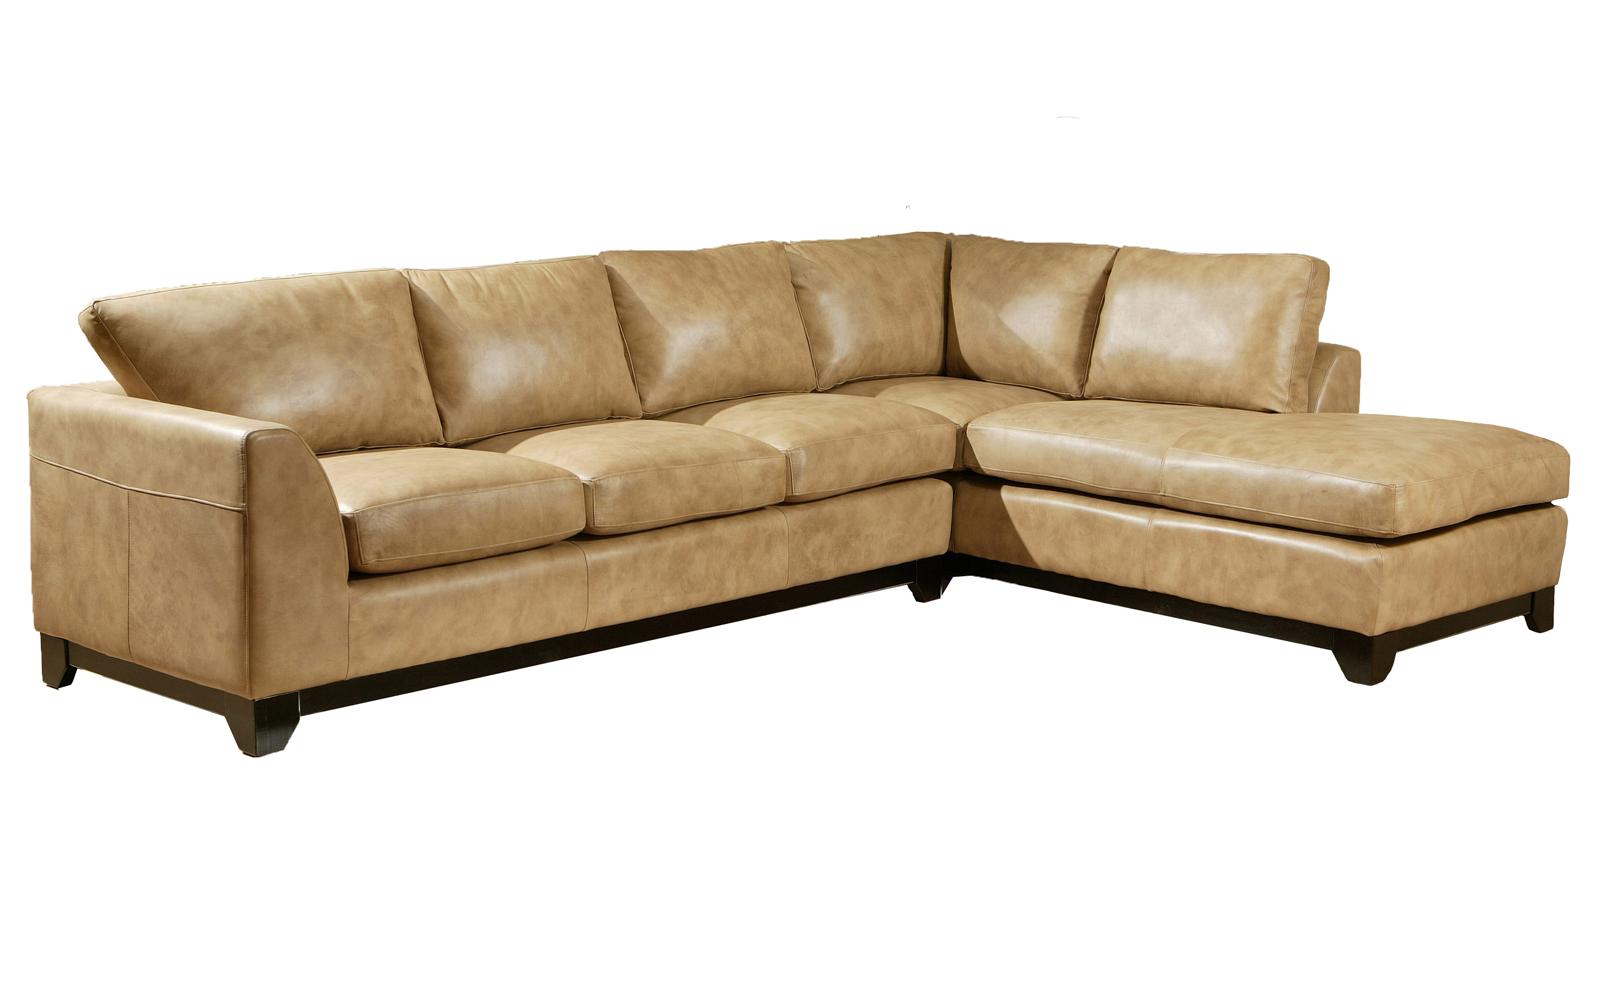 Omnia Furniture City Sleek Sofa